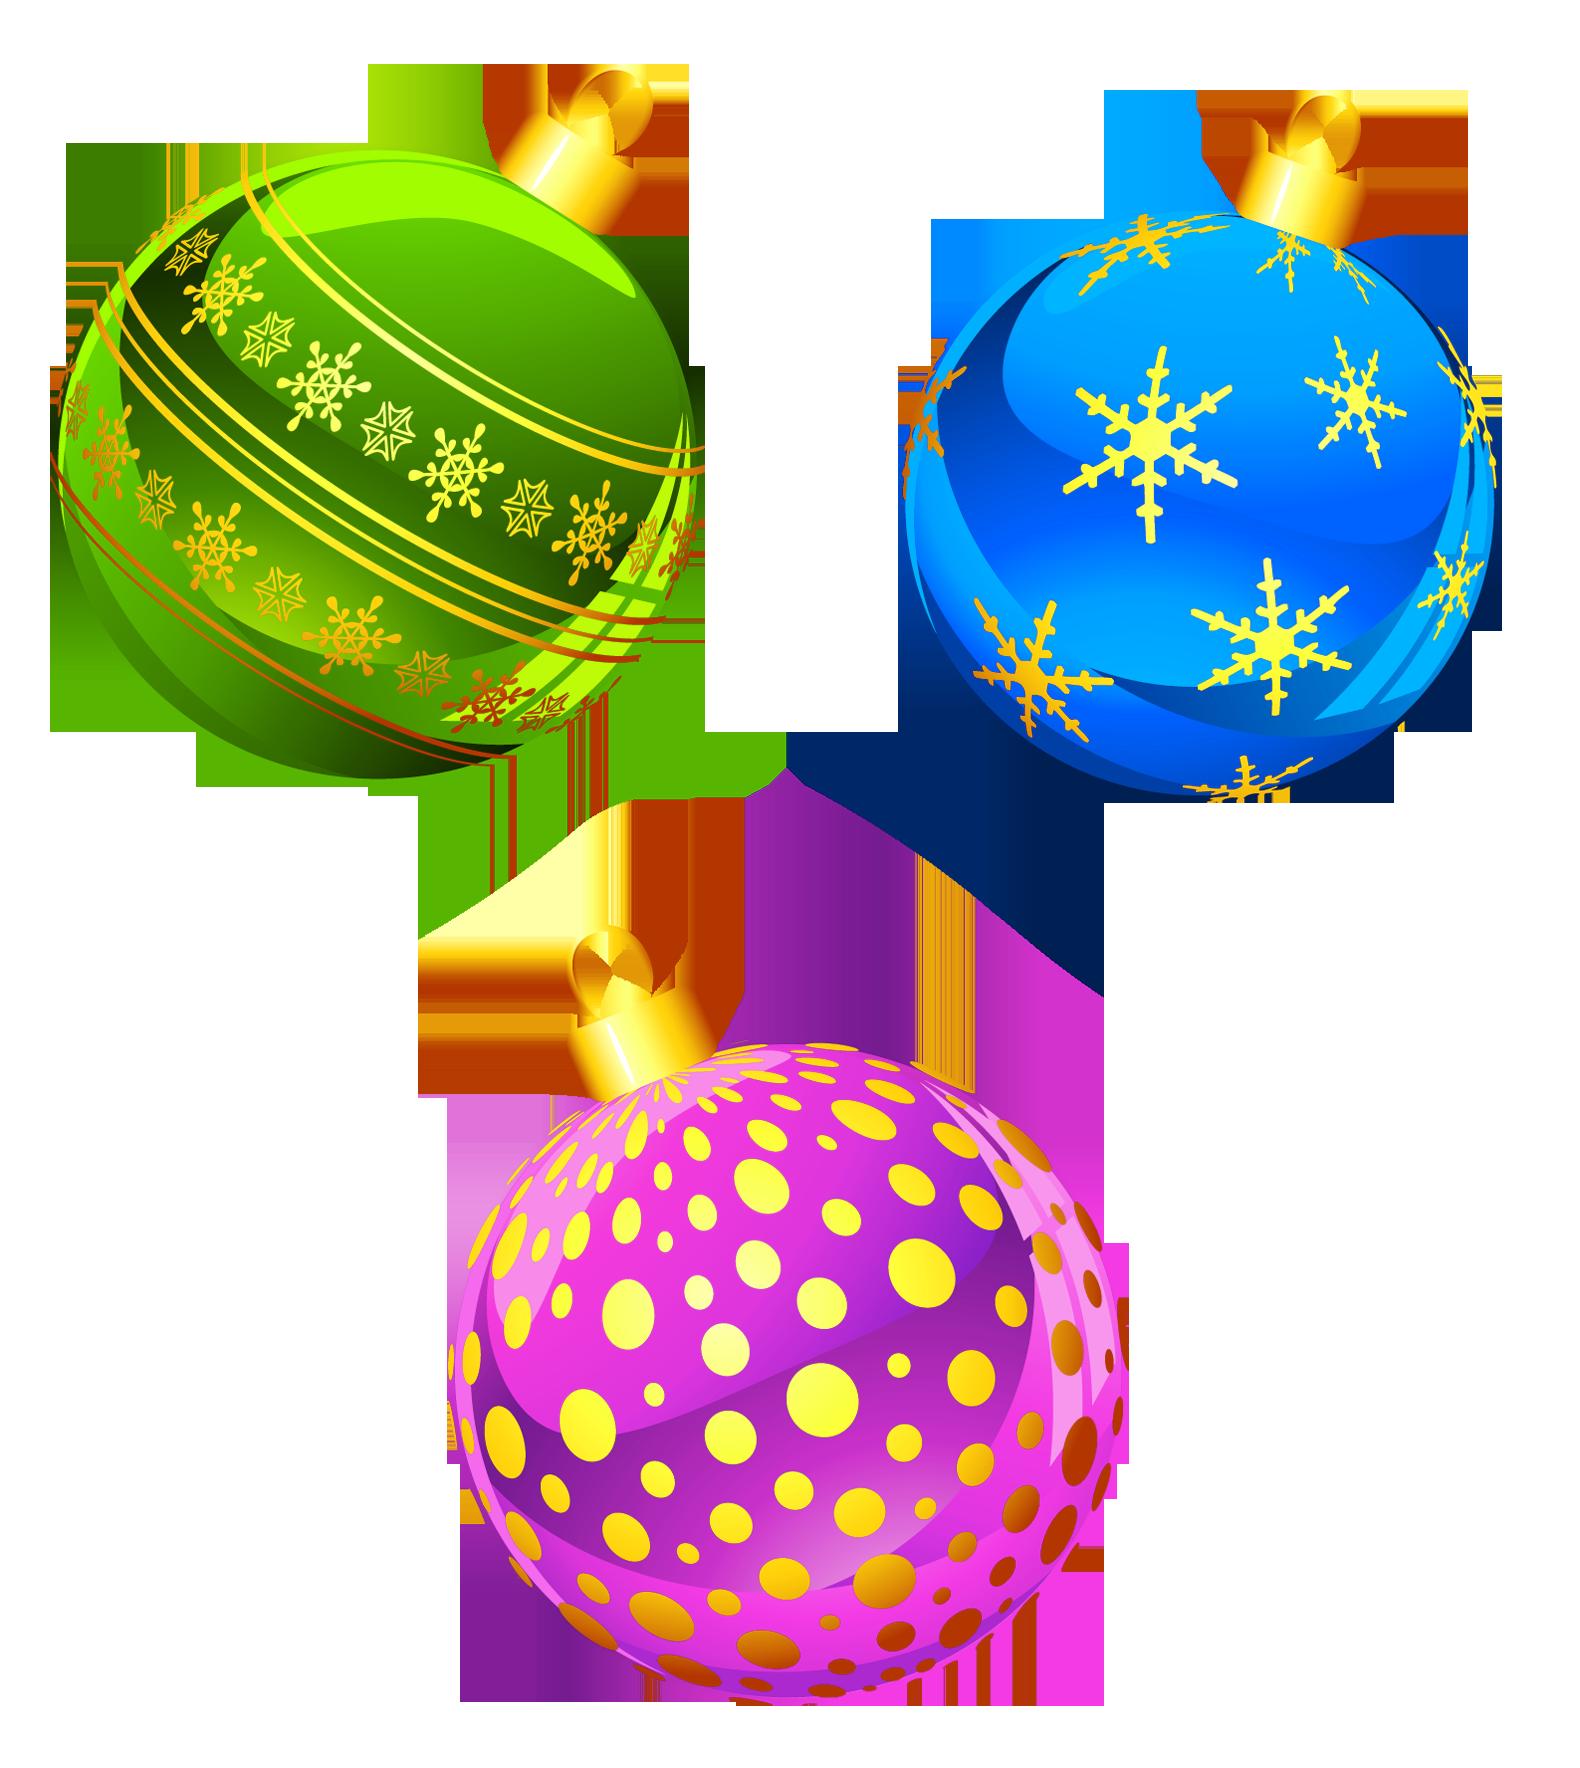 Christmas decorations clipart images - Christmas Ornaments Clip Art